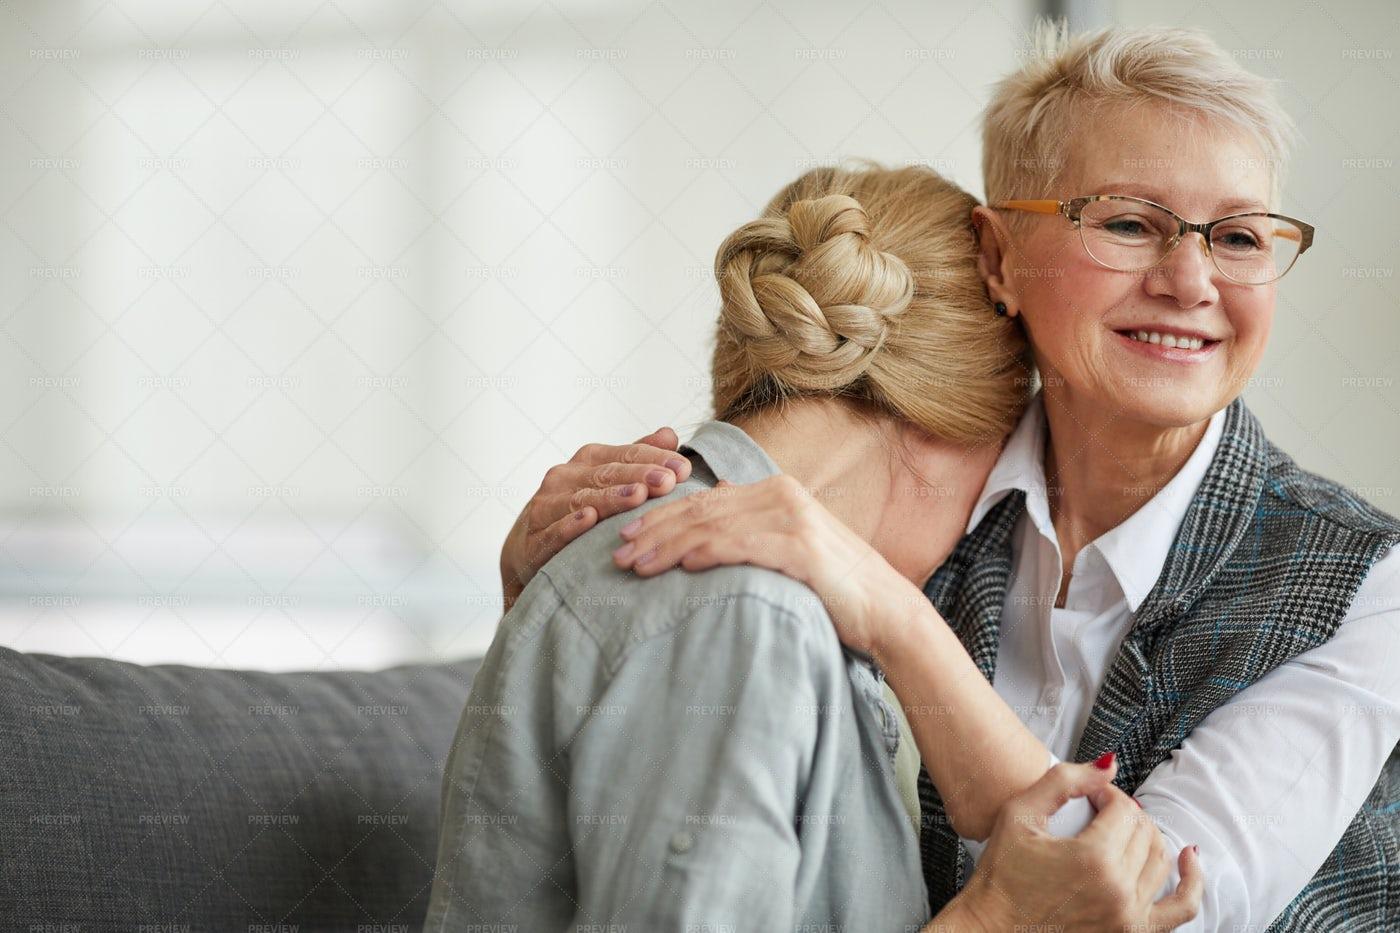 Smiling Female Psychologist...: Stock Photos